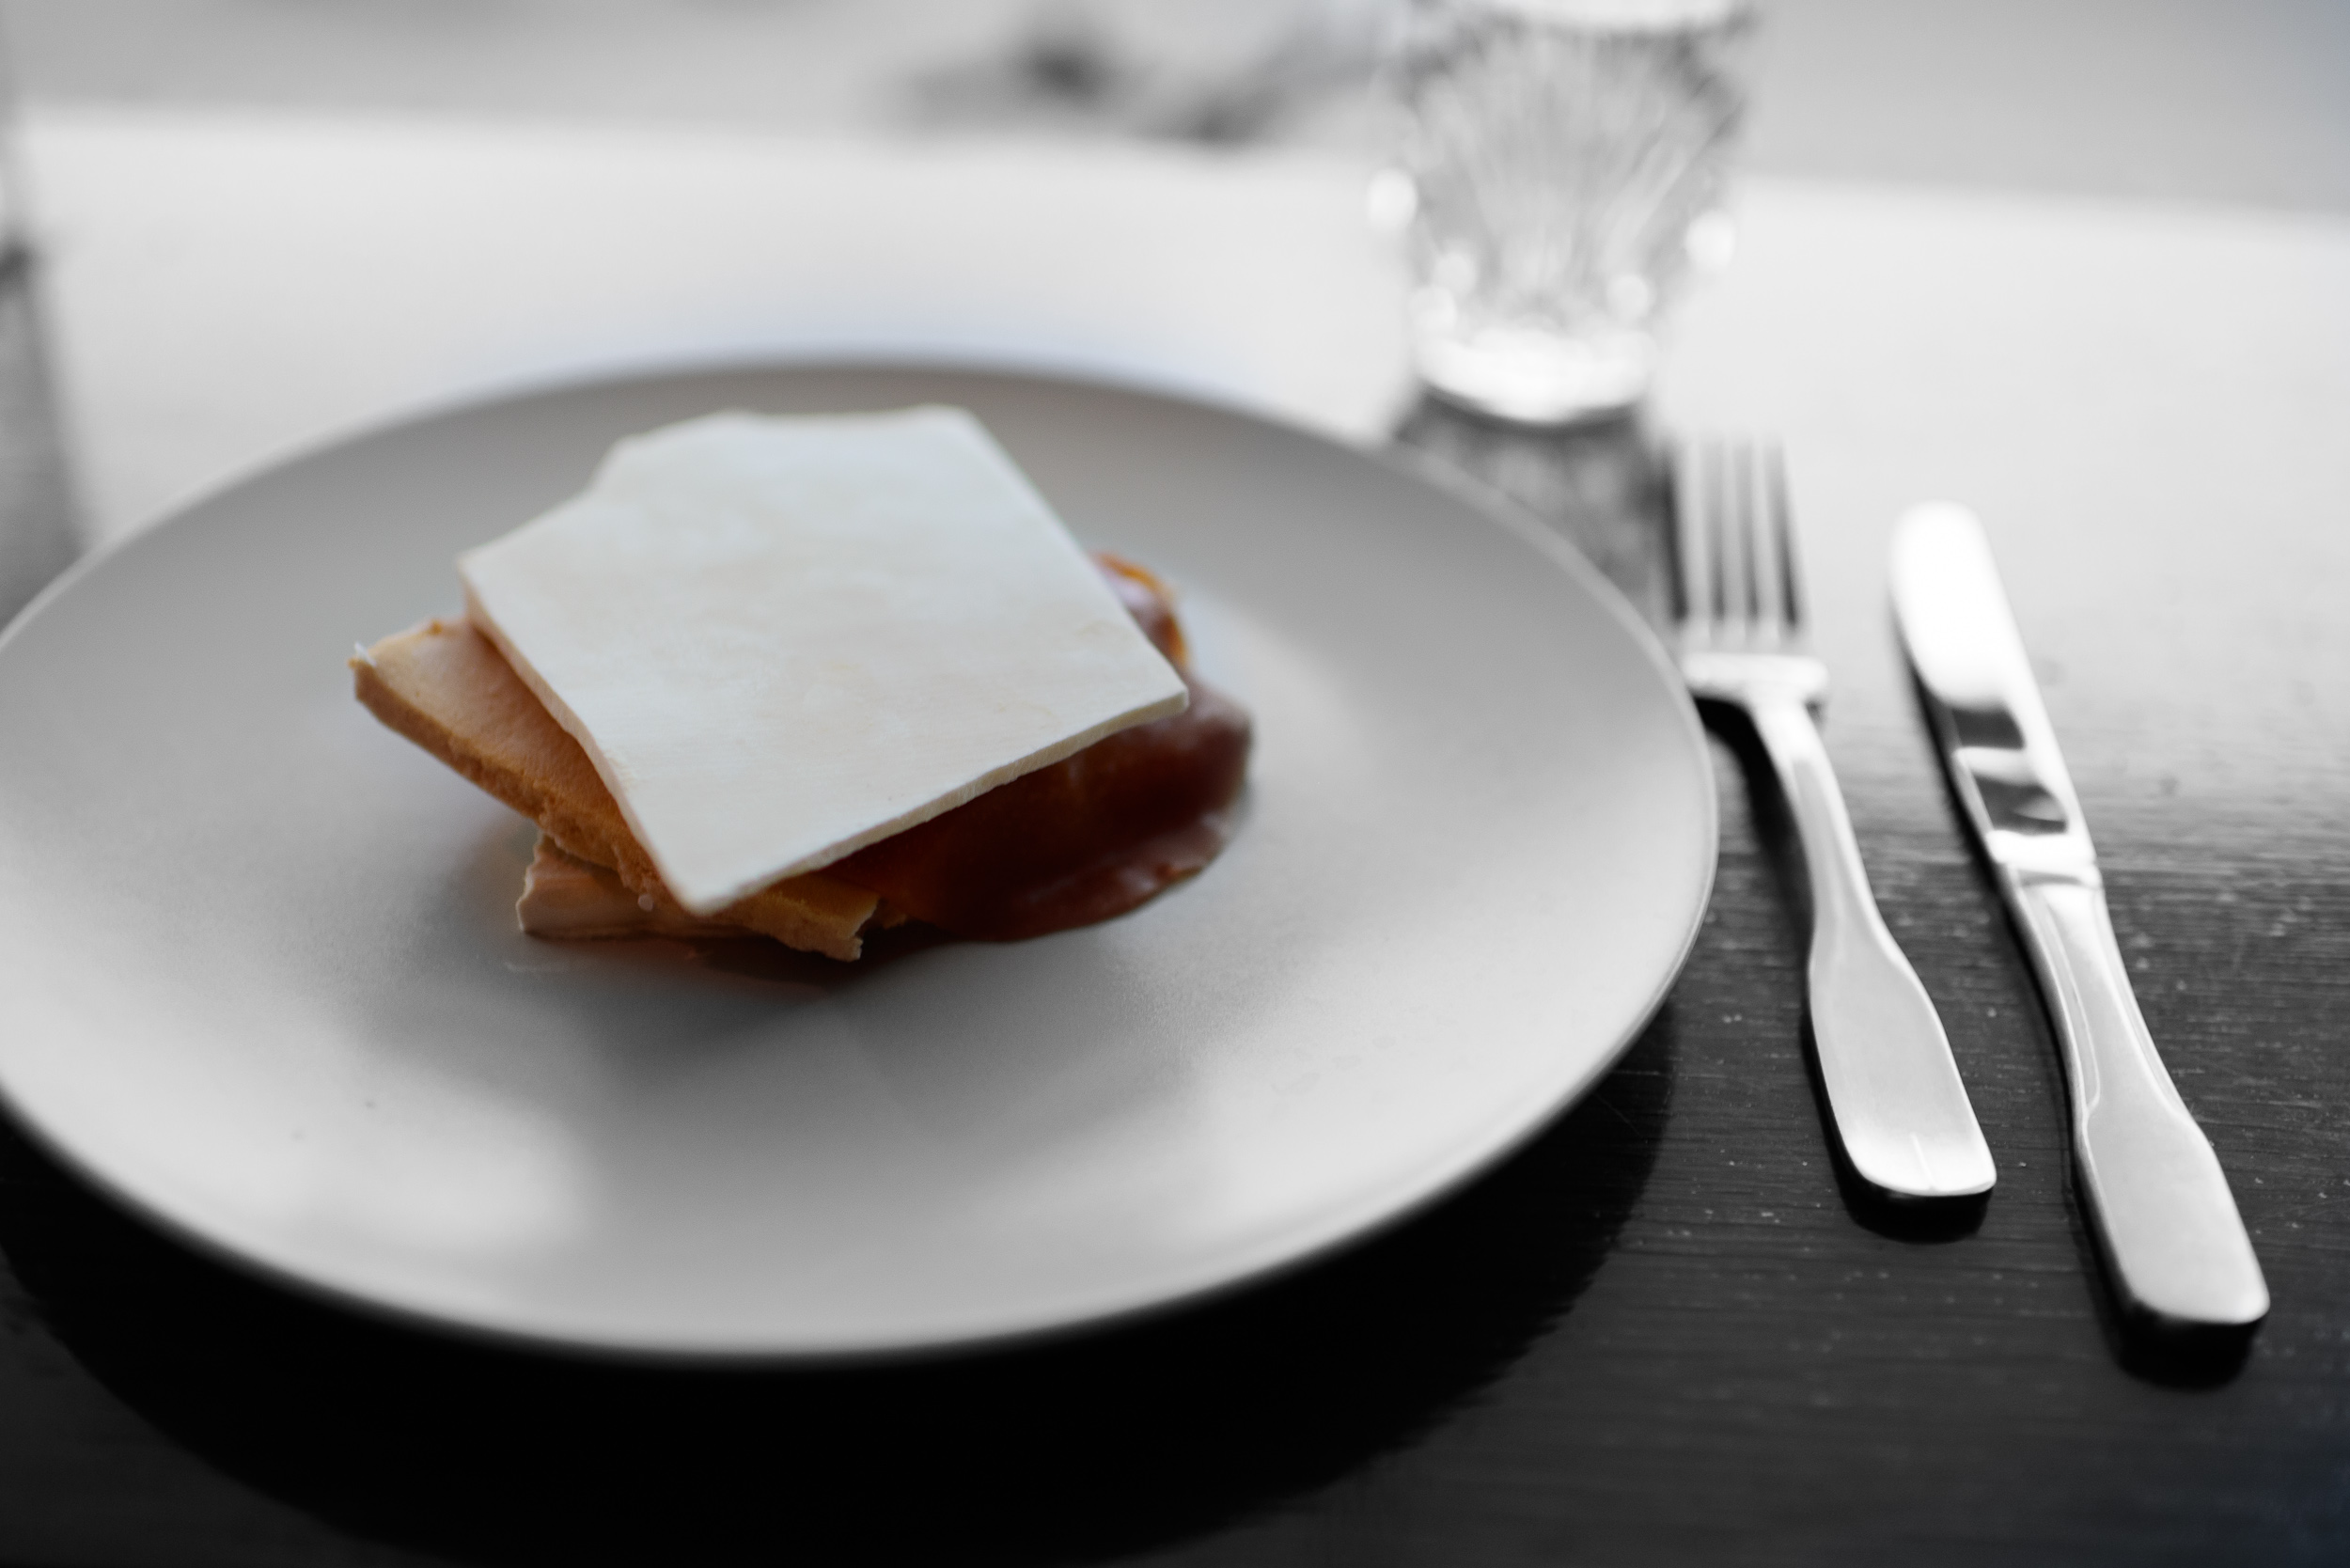 10th Course: Cream, Salted Caramel, Horseradish